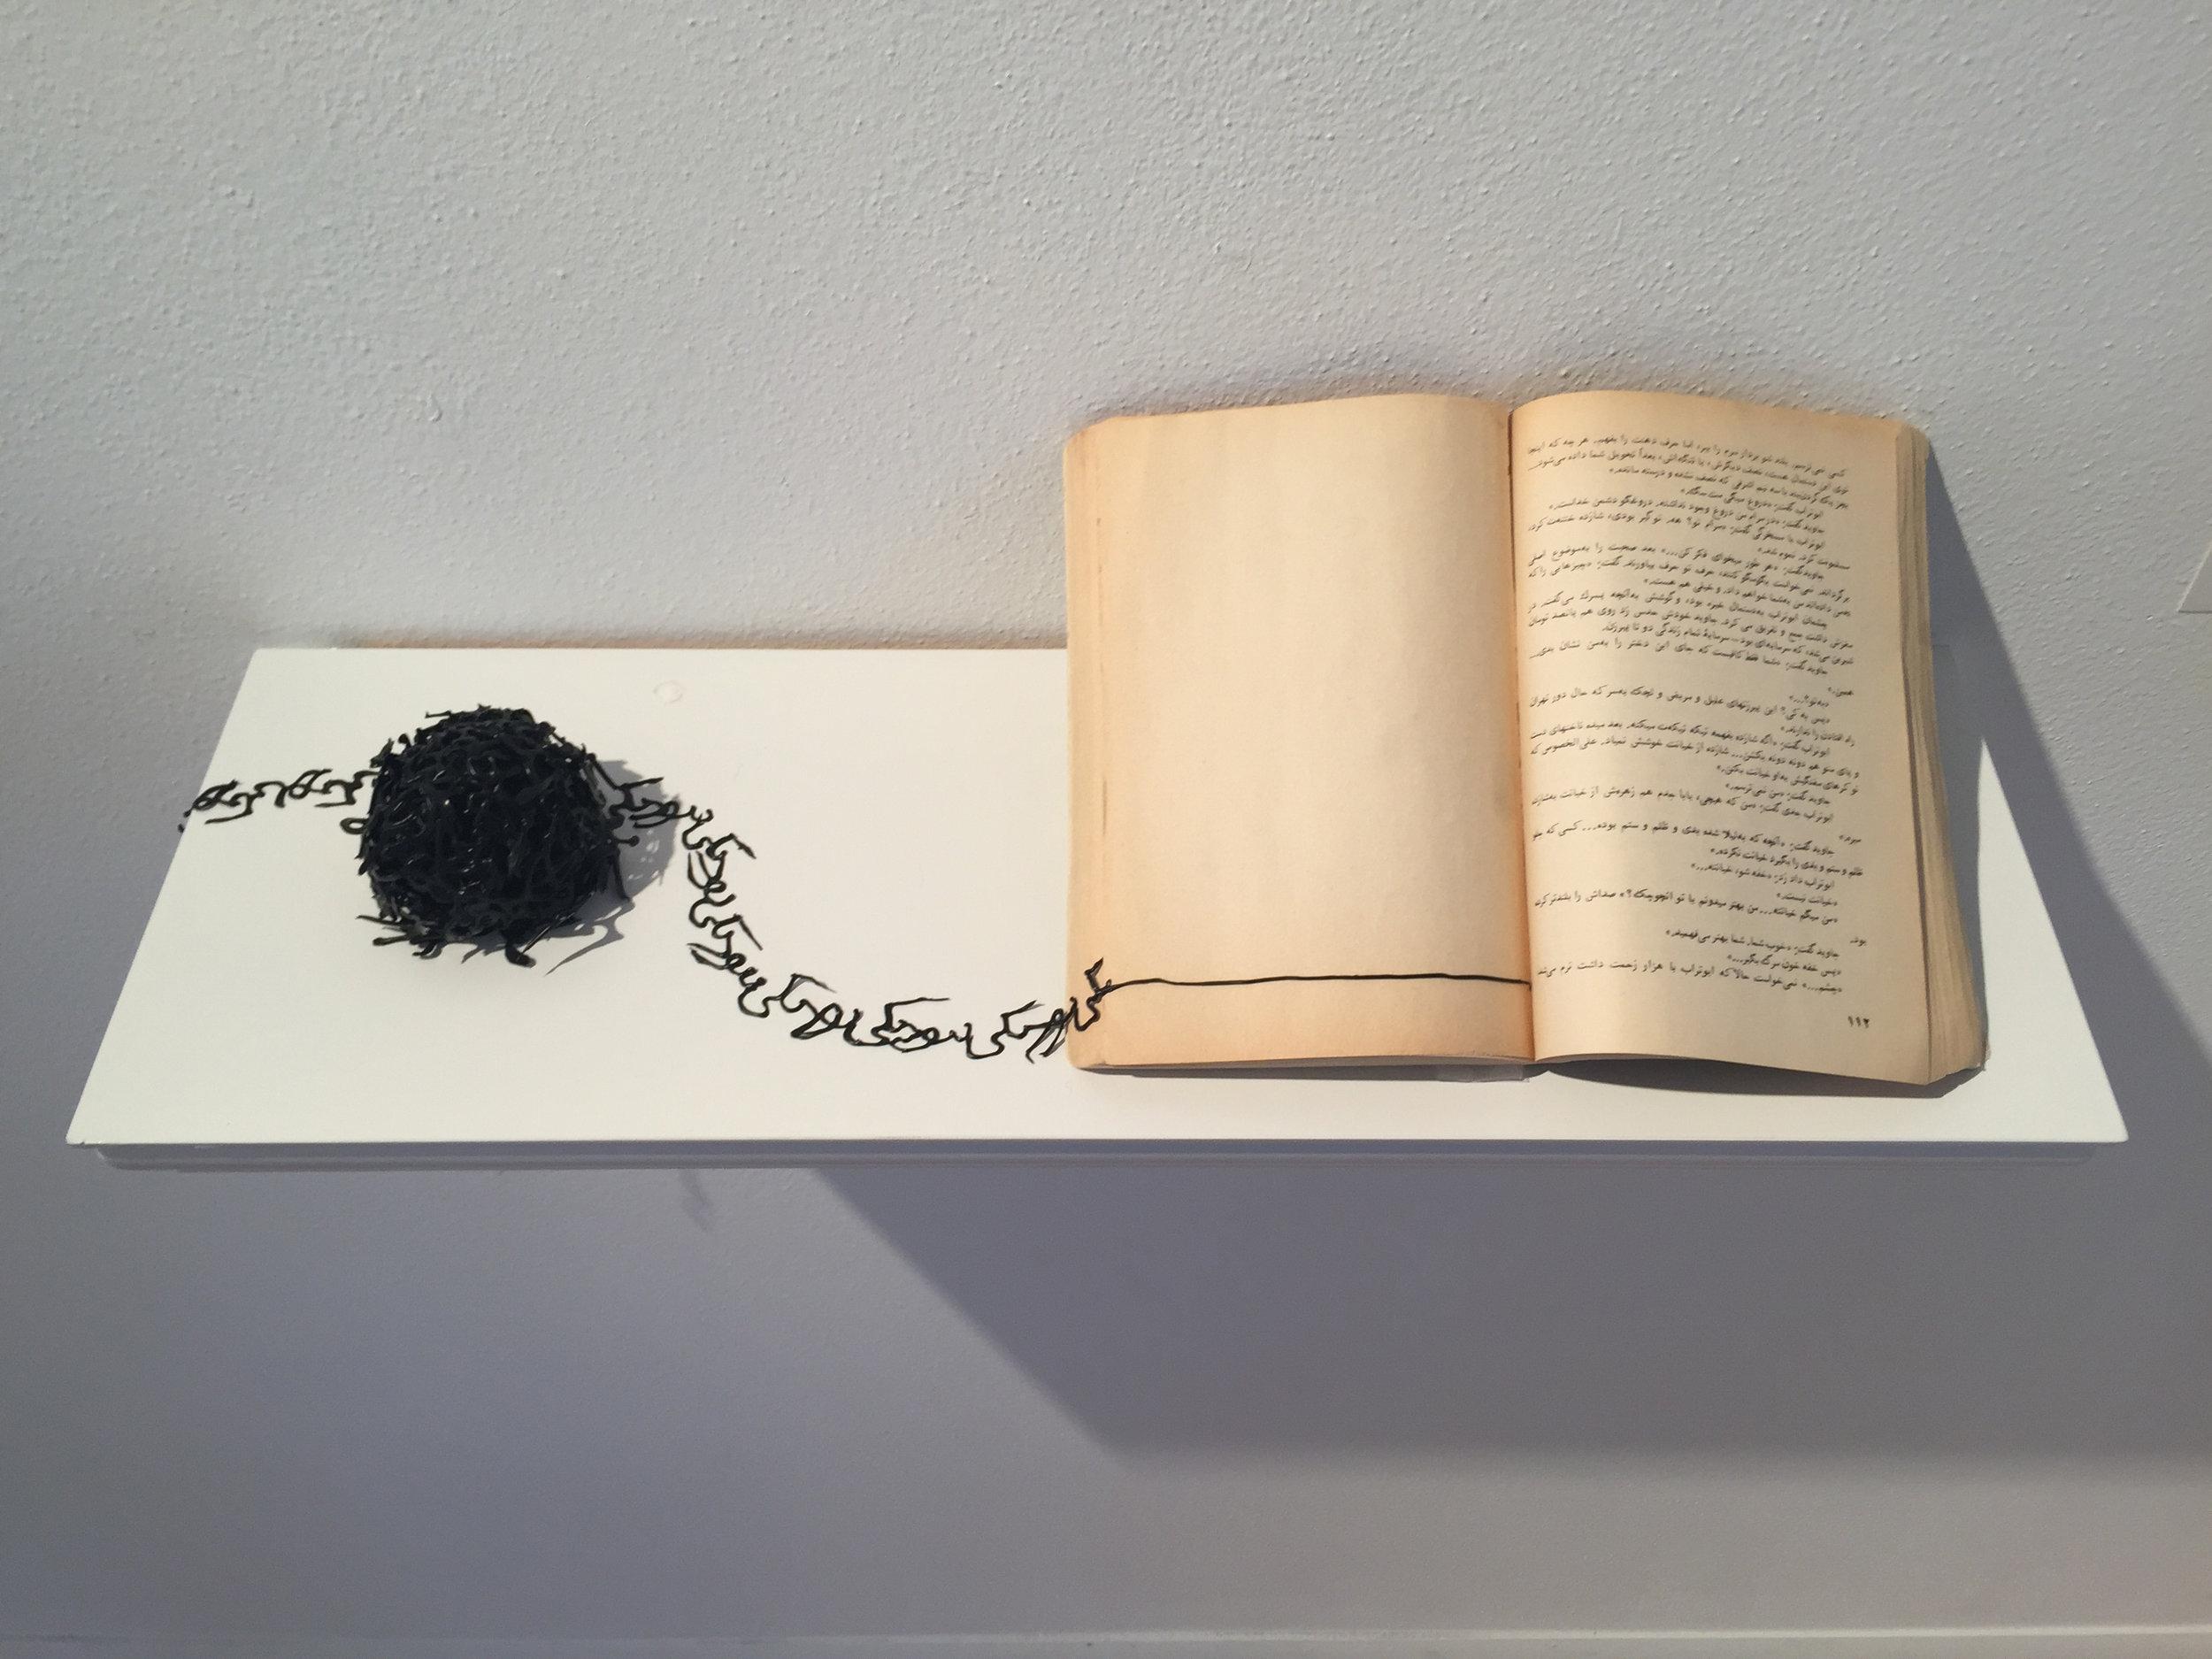 Decomposing a novel, 2015